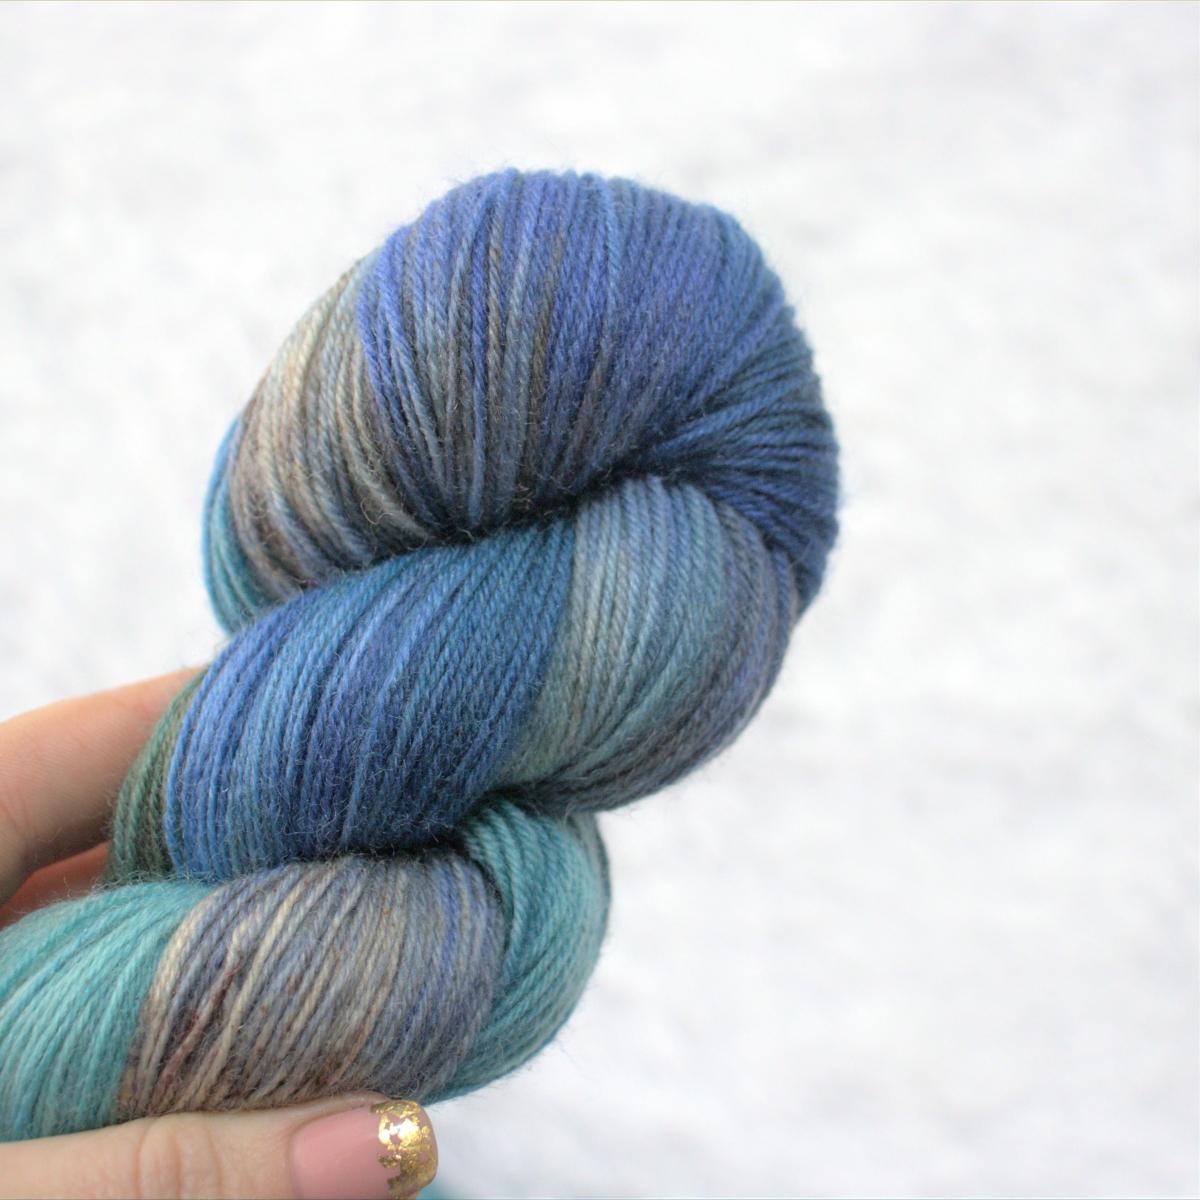 woodico.pro hand dyed yarn 052 1200x1200 - Hand dyed yarn / 052